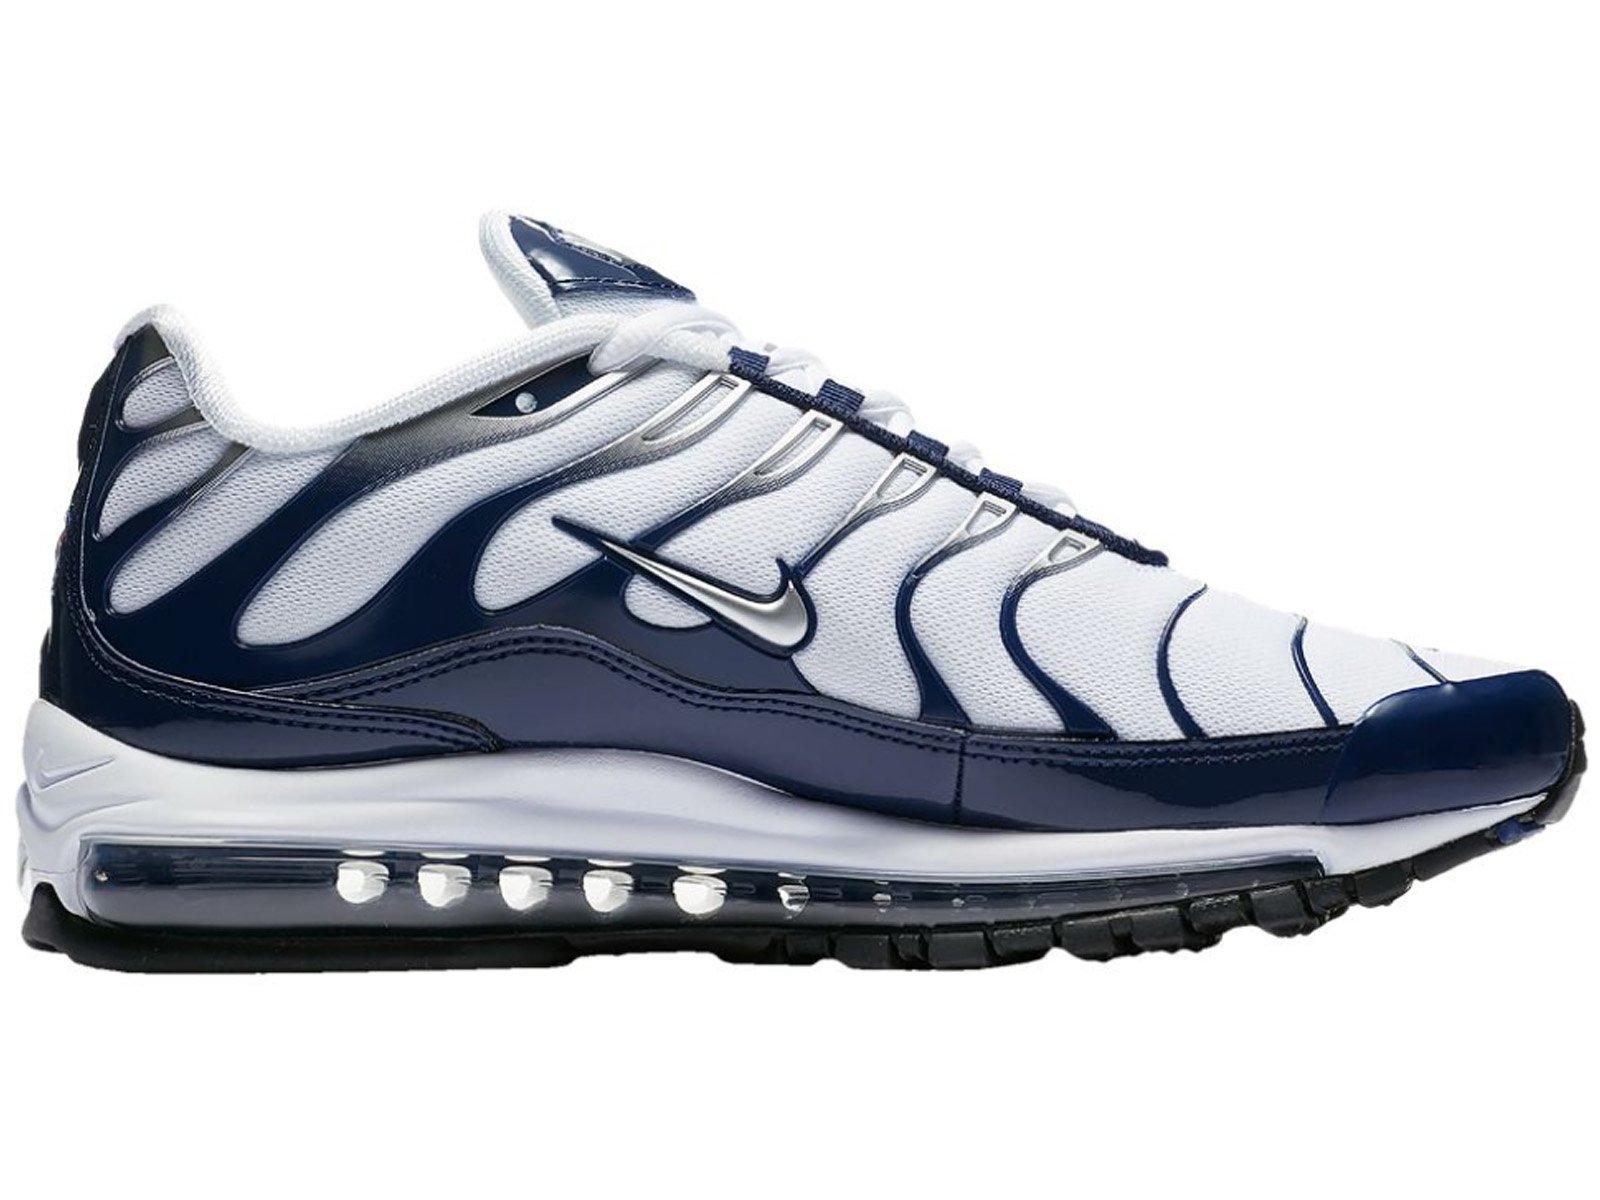 Nike Air Max 97 Plus Mens Running Trainers AH8144 Sneakers Shoes (UK 6 US 7 EU 40, White Metallic Silver 100)